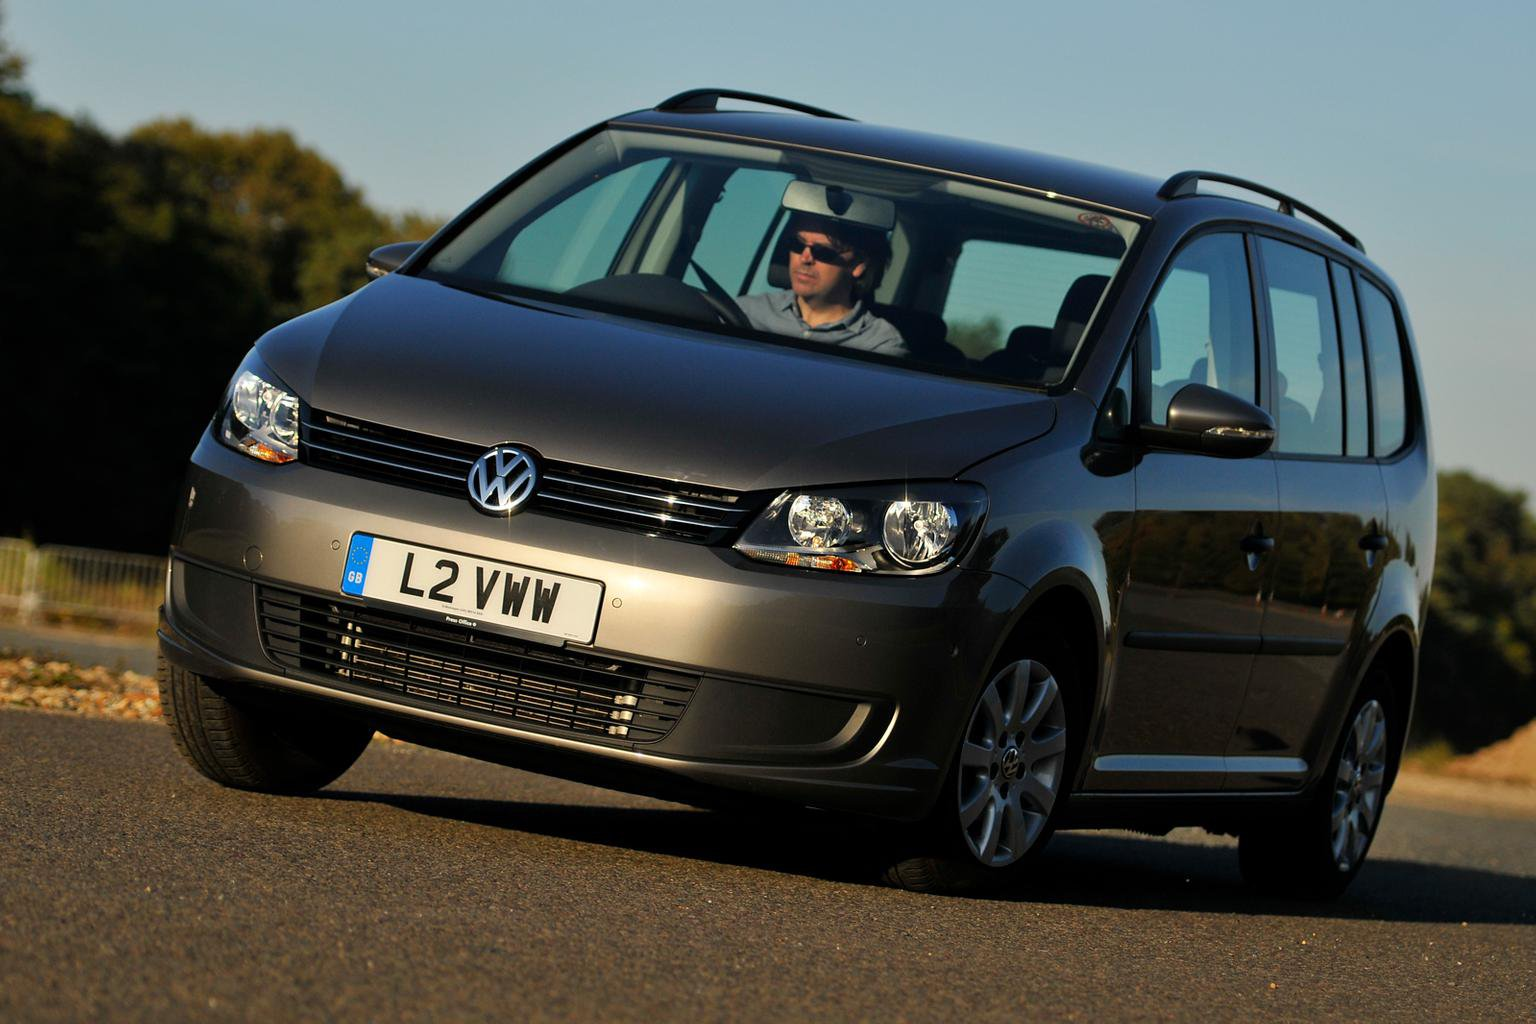 Deal of the day: Volkswagen Touran